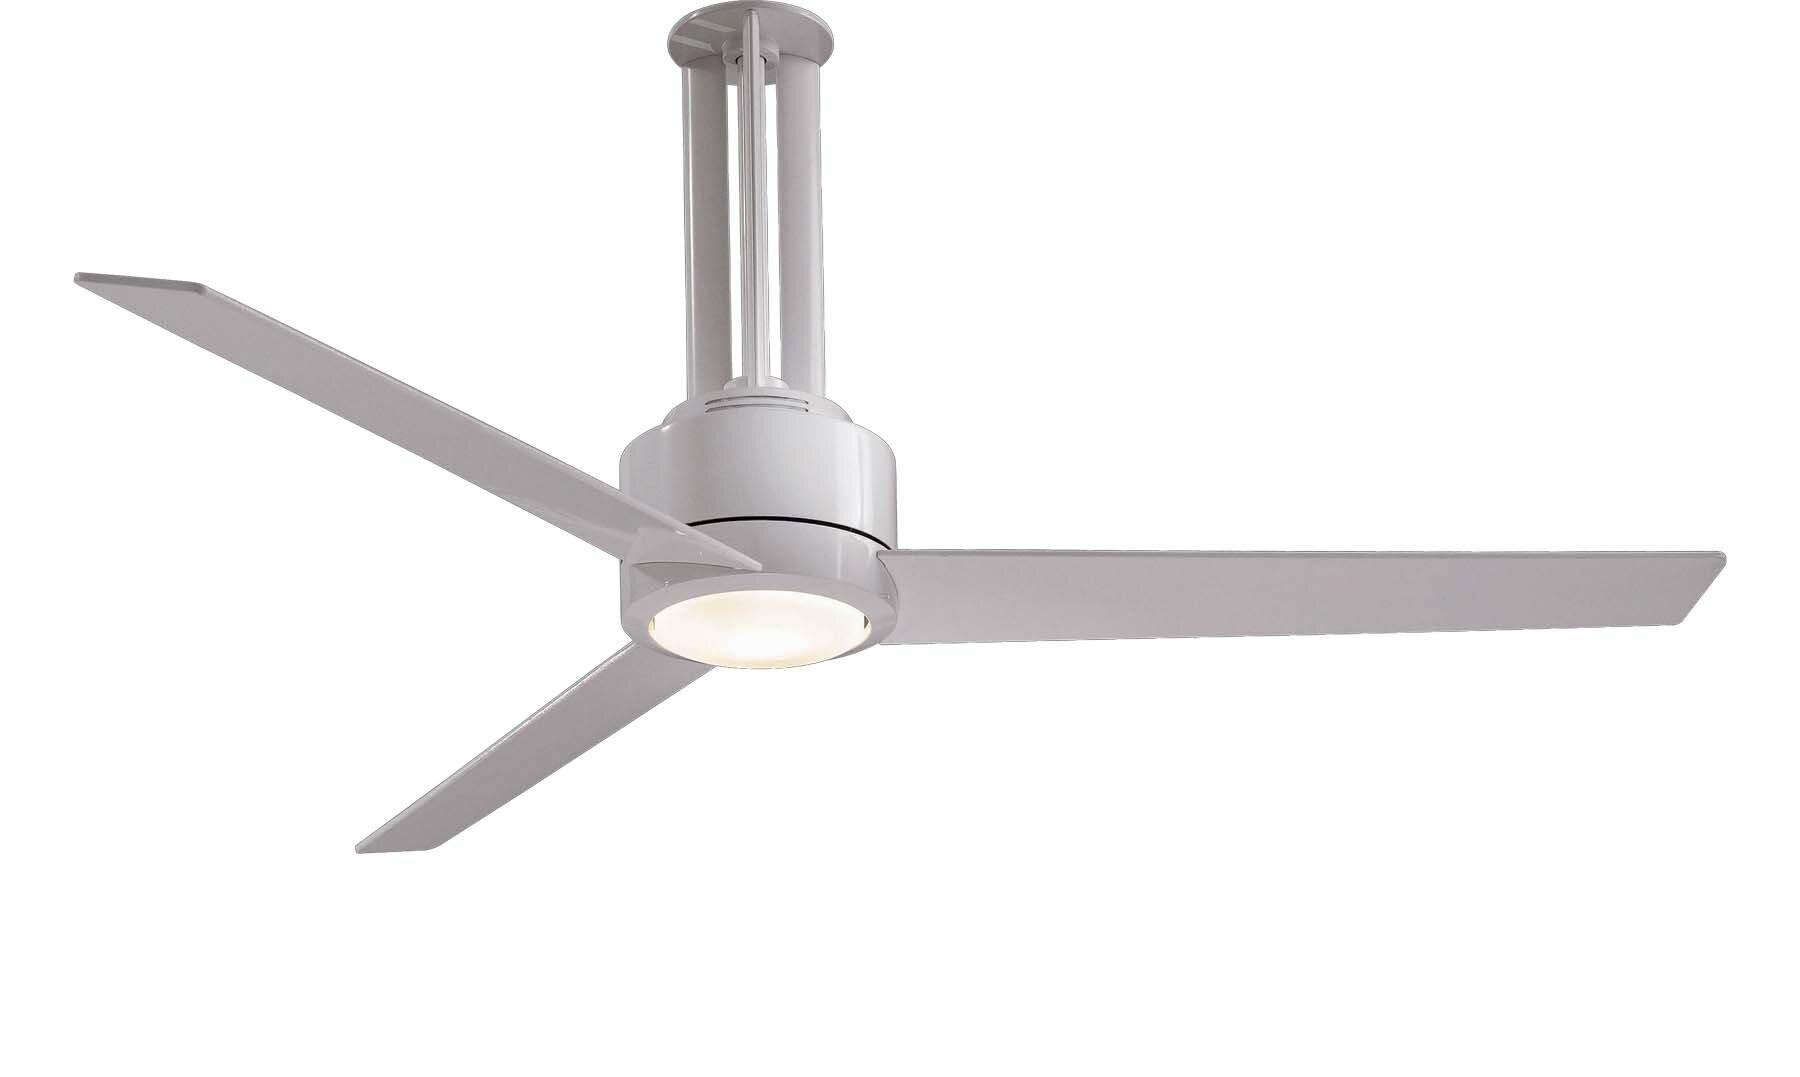 Minka aire 56 flyte 3 blade led ceiling fan reviews wayfair aloadofball Choice Image